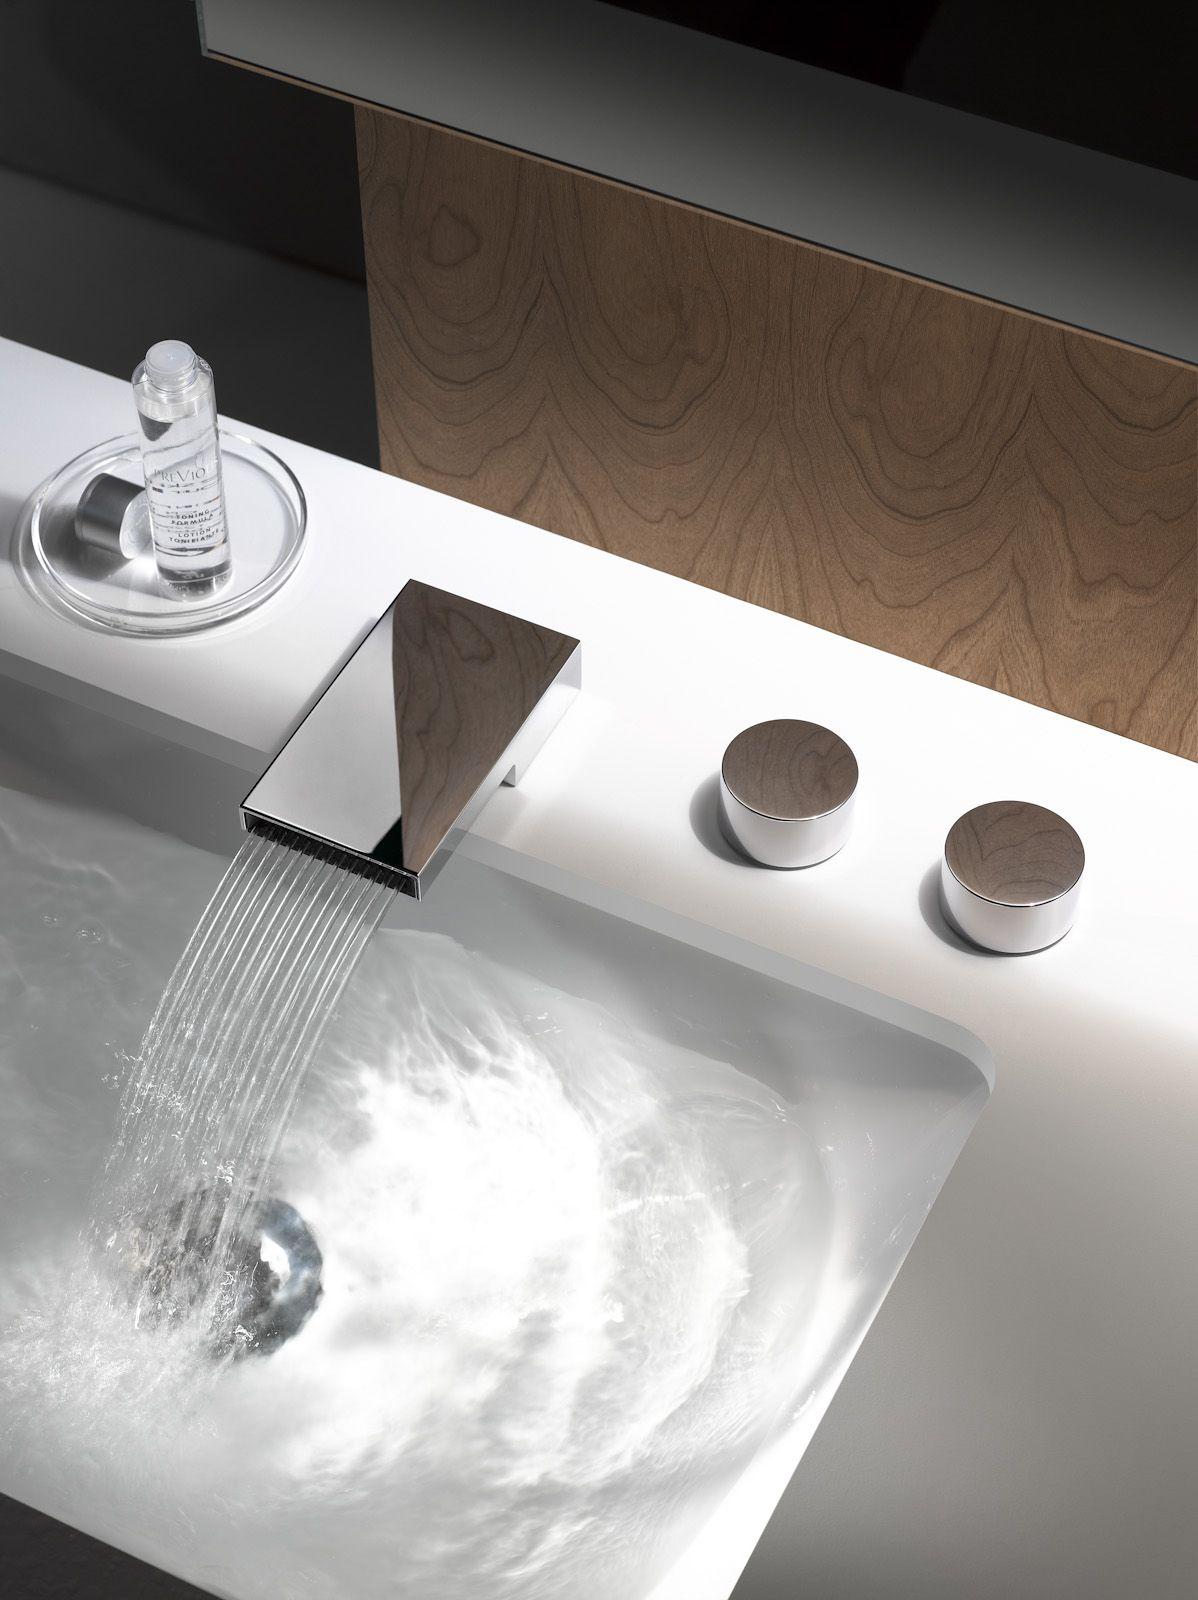 DEQUE By Dornbracht Bathroom Pinterest Bath Tap And Sinks - Dornbracht bathroom faucet